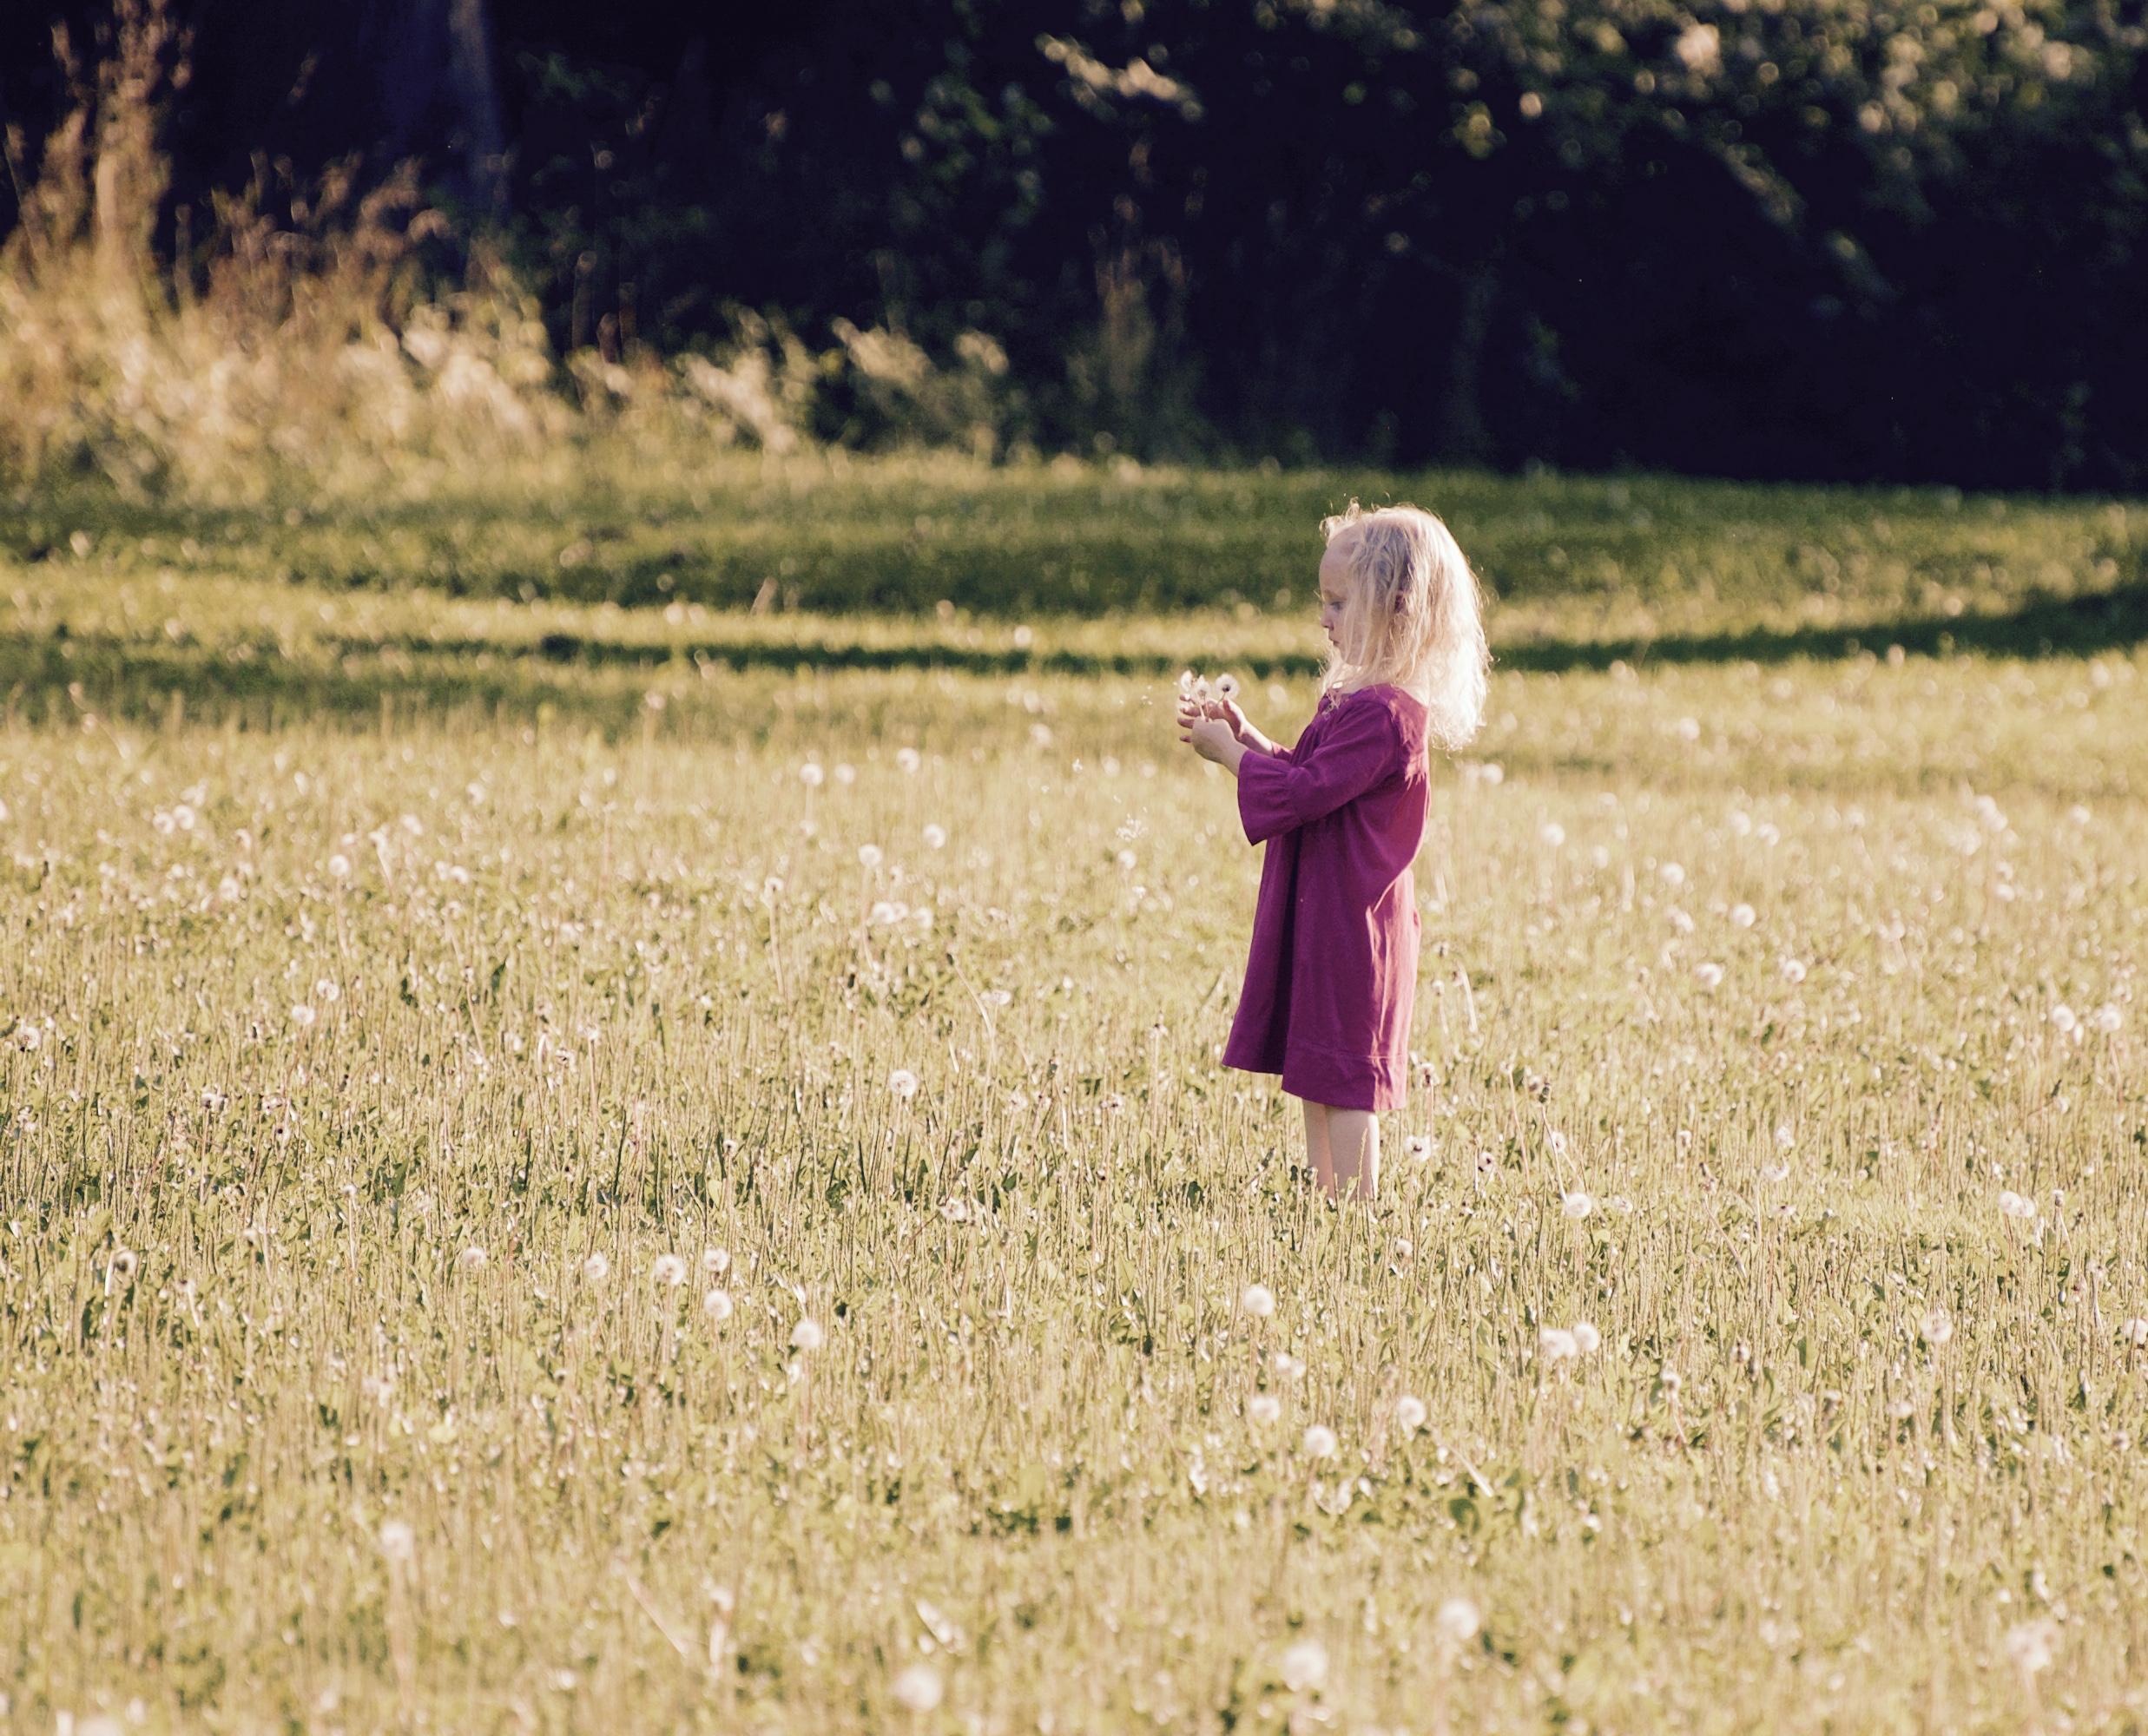 Flower Girl. Westmorland Park. Madison, Wisconsin. August 2016. © William D. Walker